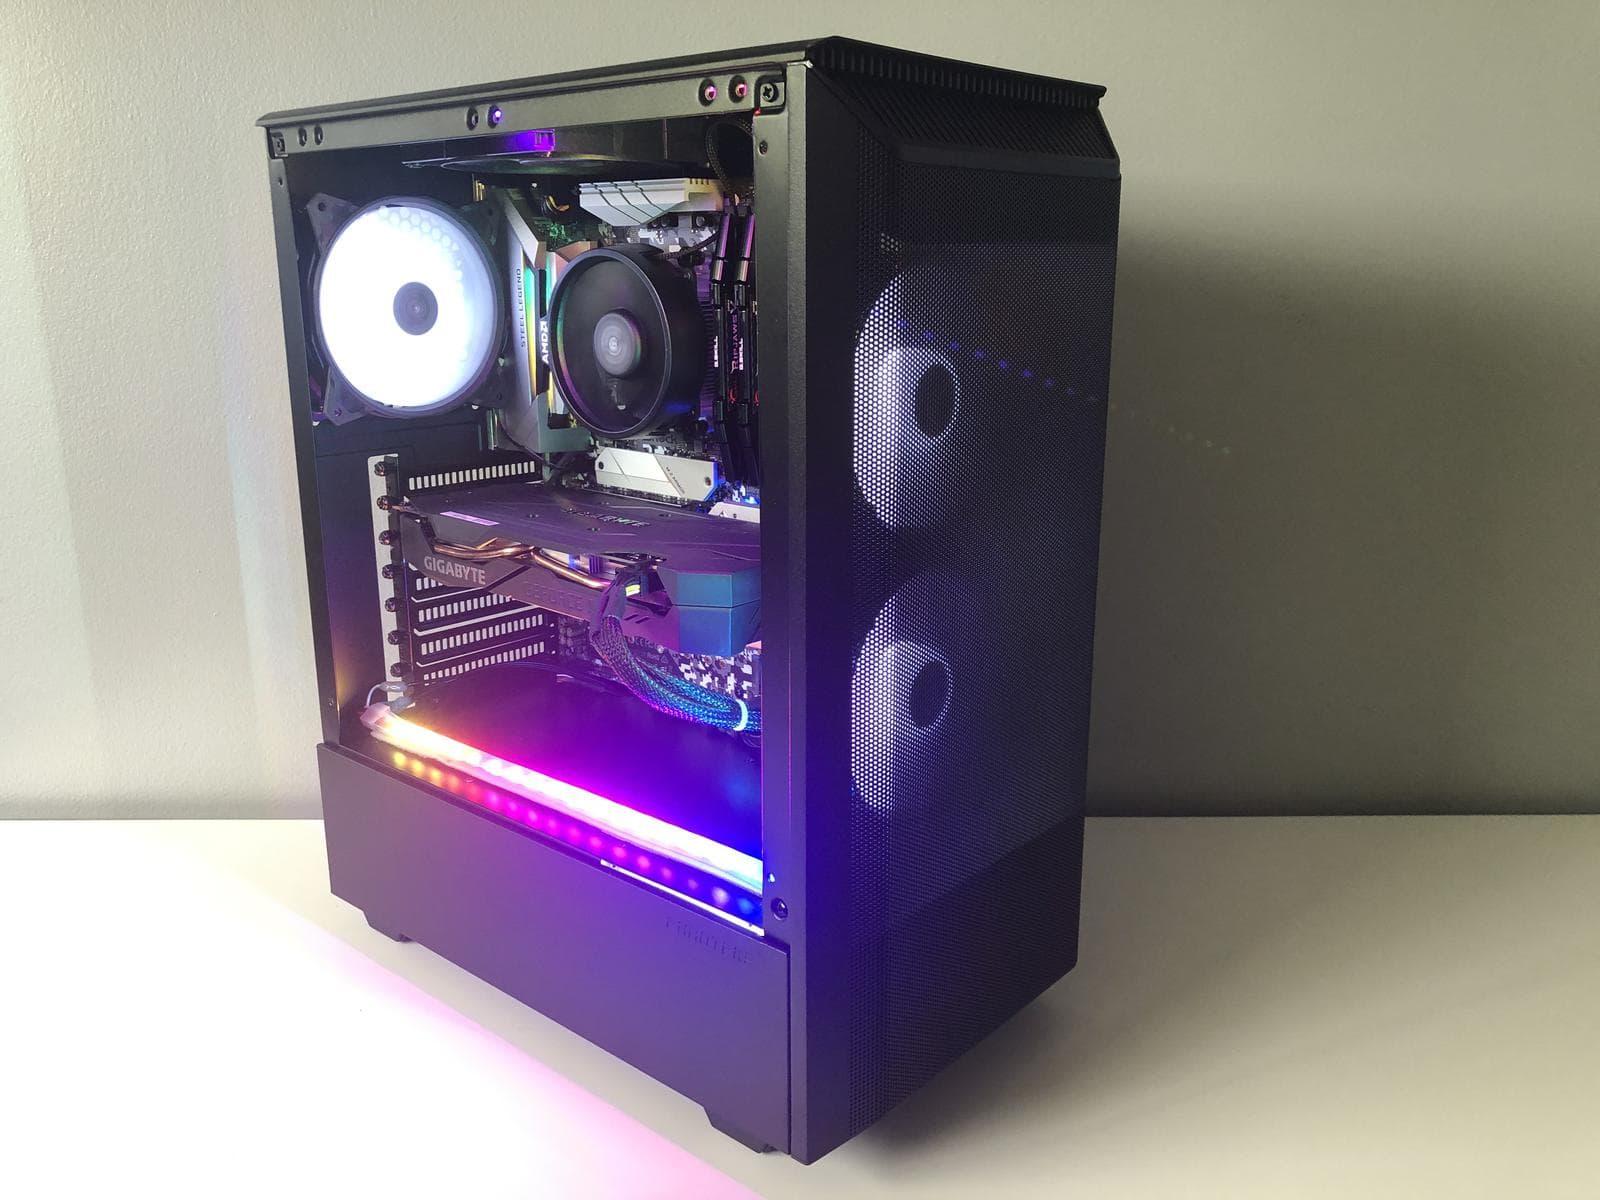 phanteks p300a build